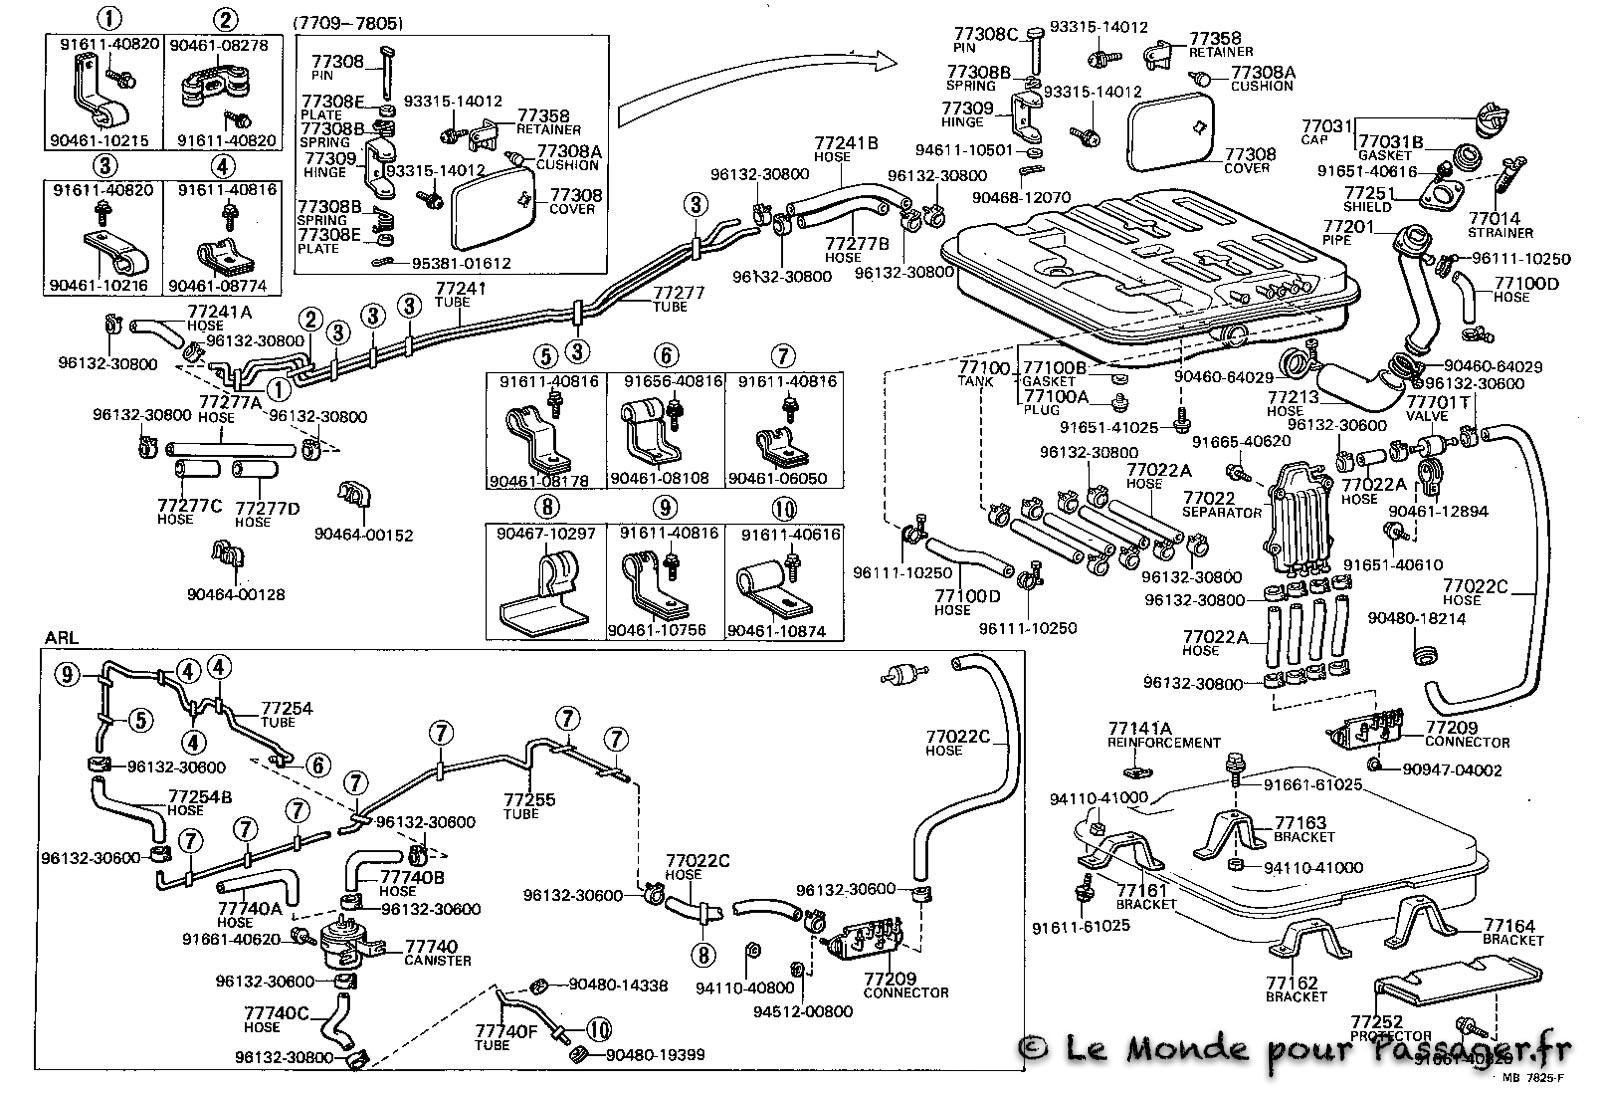 Fj55-Eclatés-Techniques006